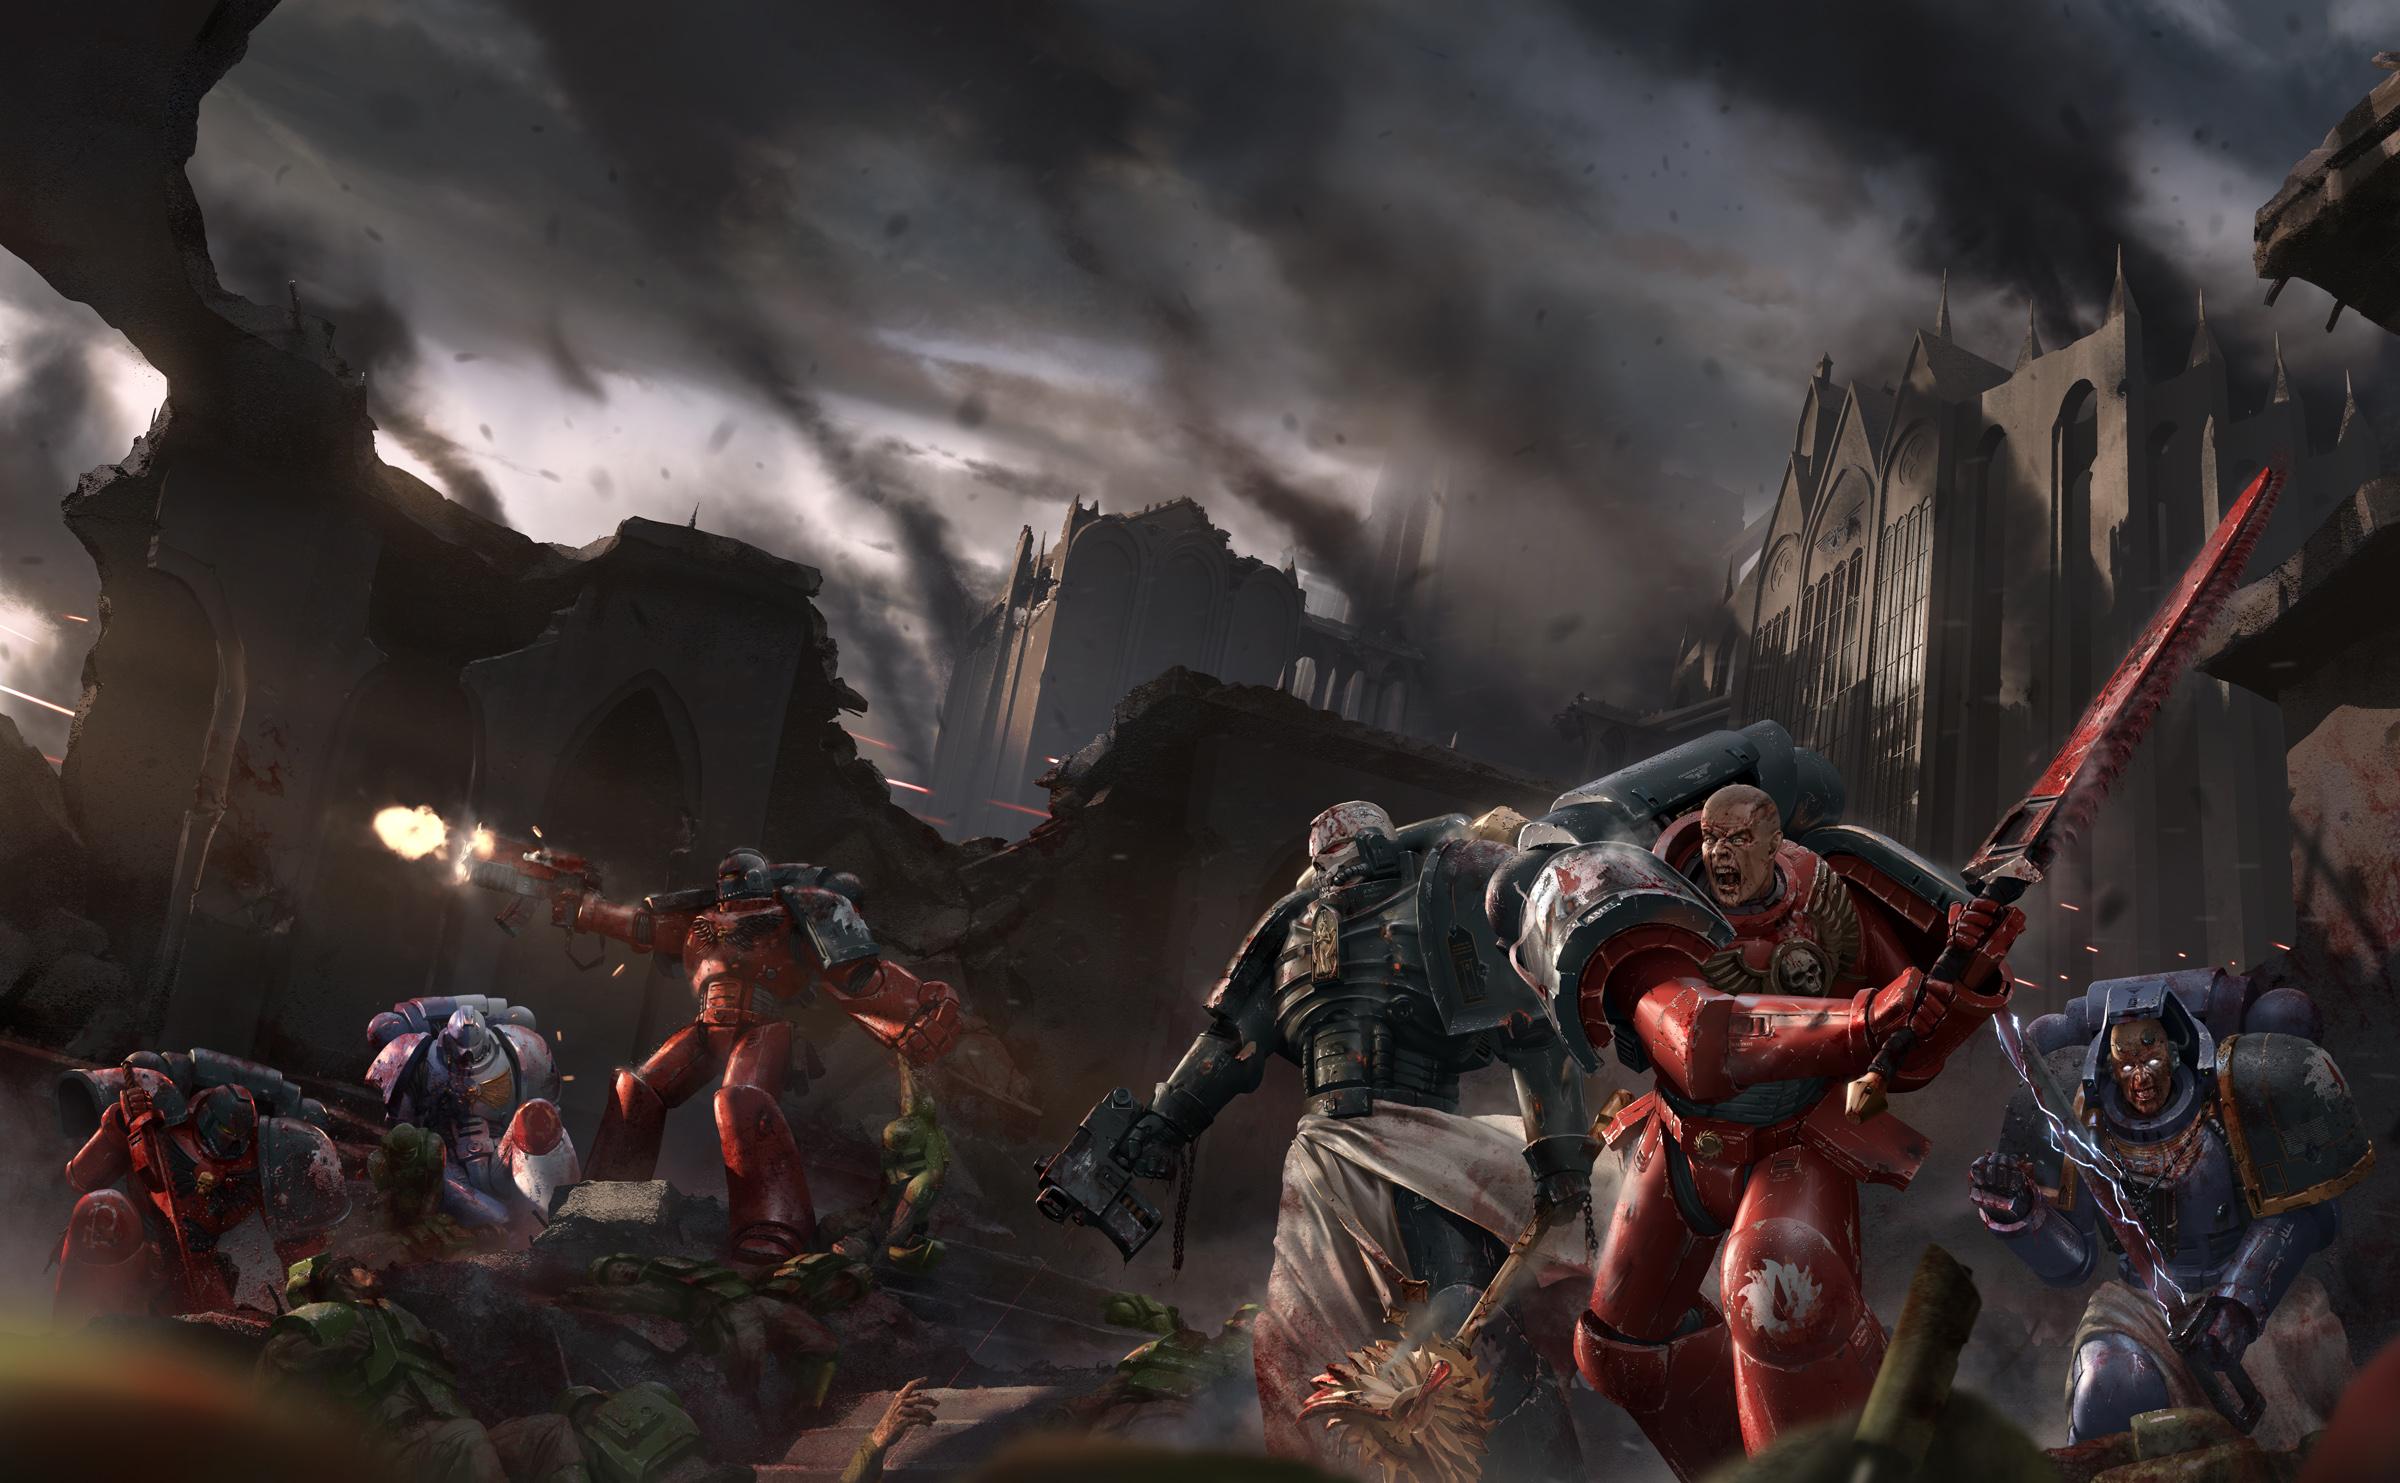 Black Library: Sons Of Wrath by ukitakumuki on DeviantArt